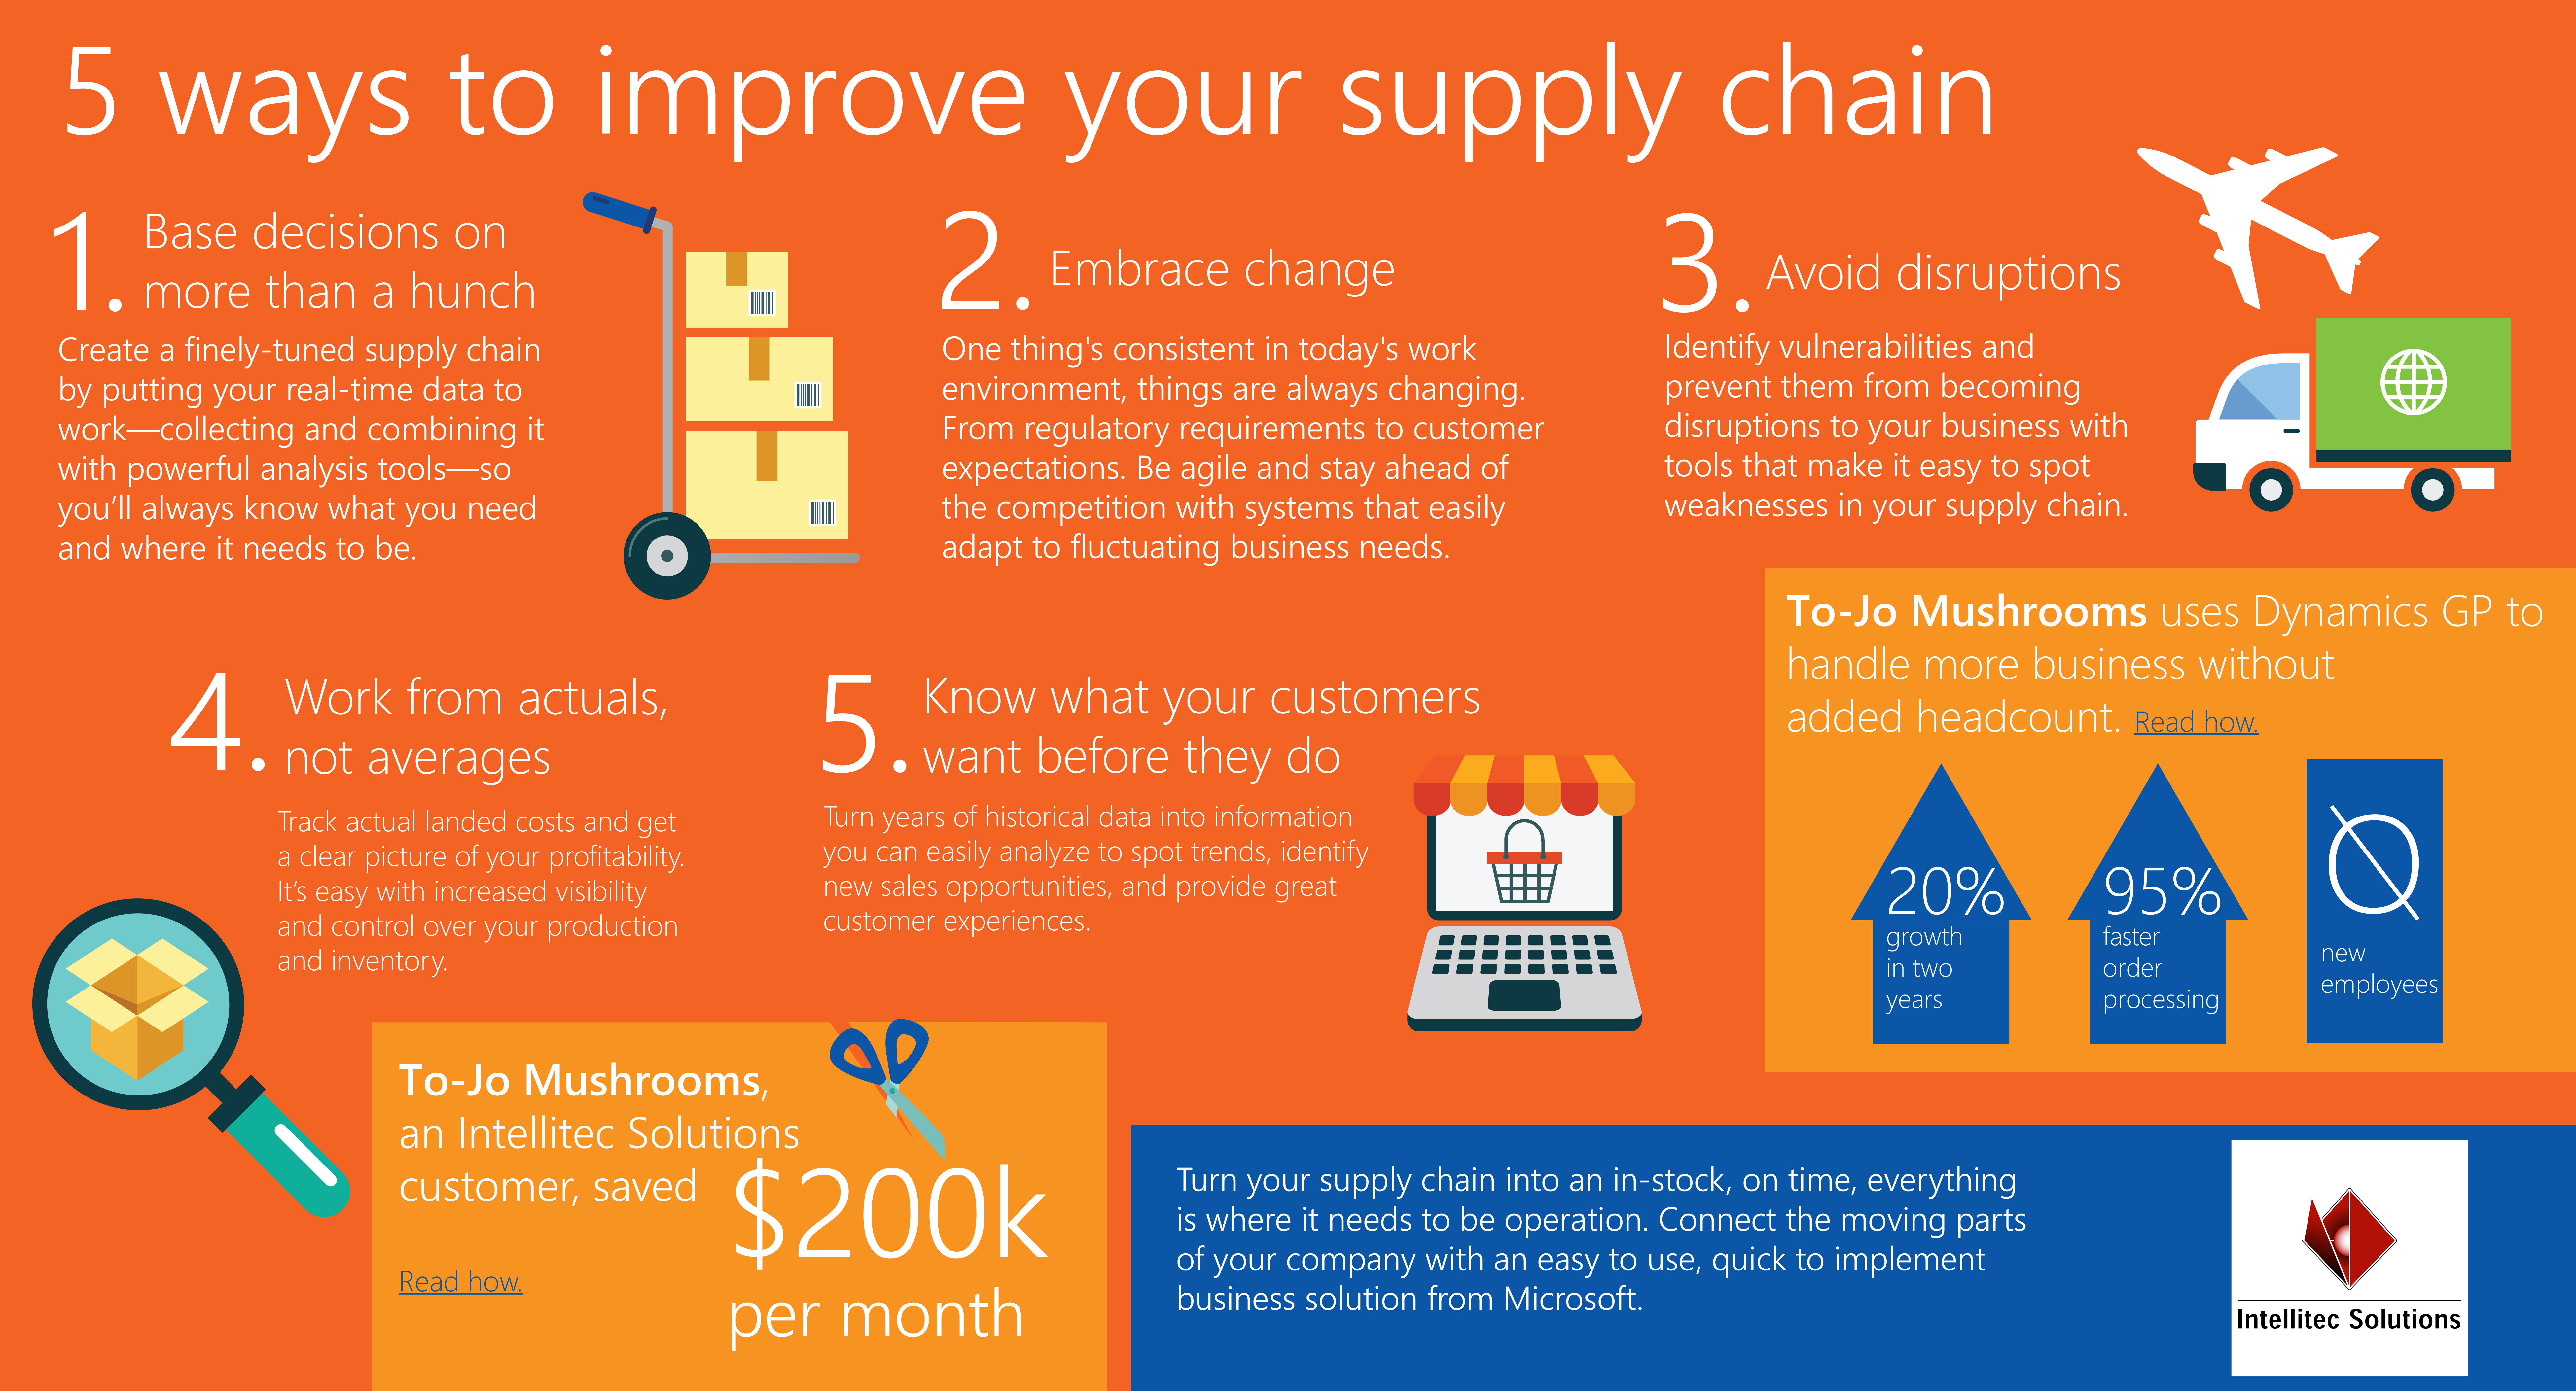 Logistics and Supply Chain Management assignment expert legit